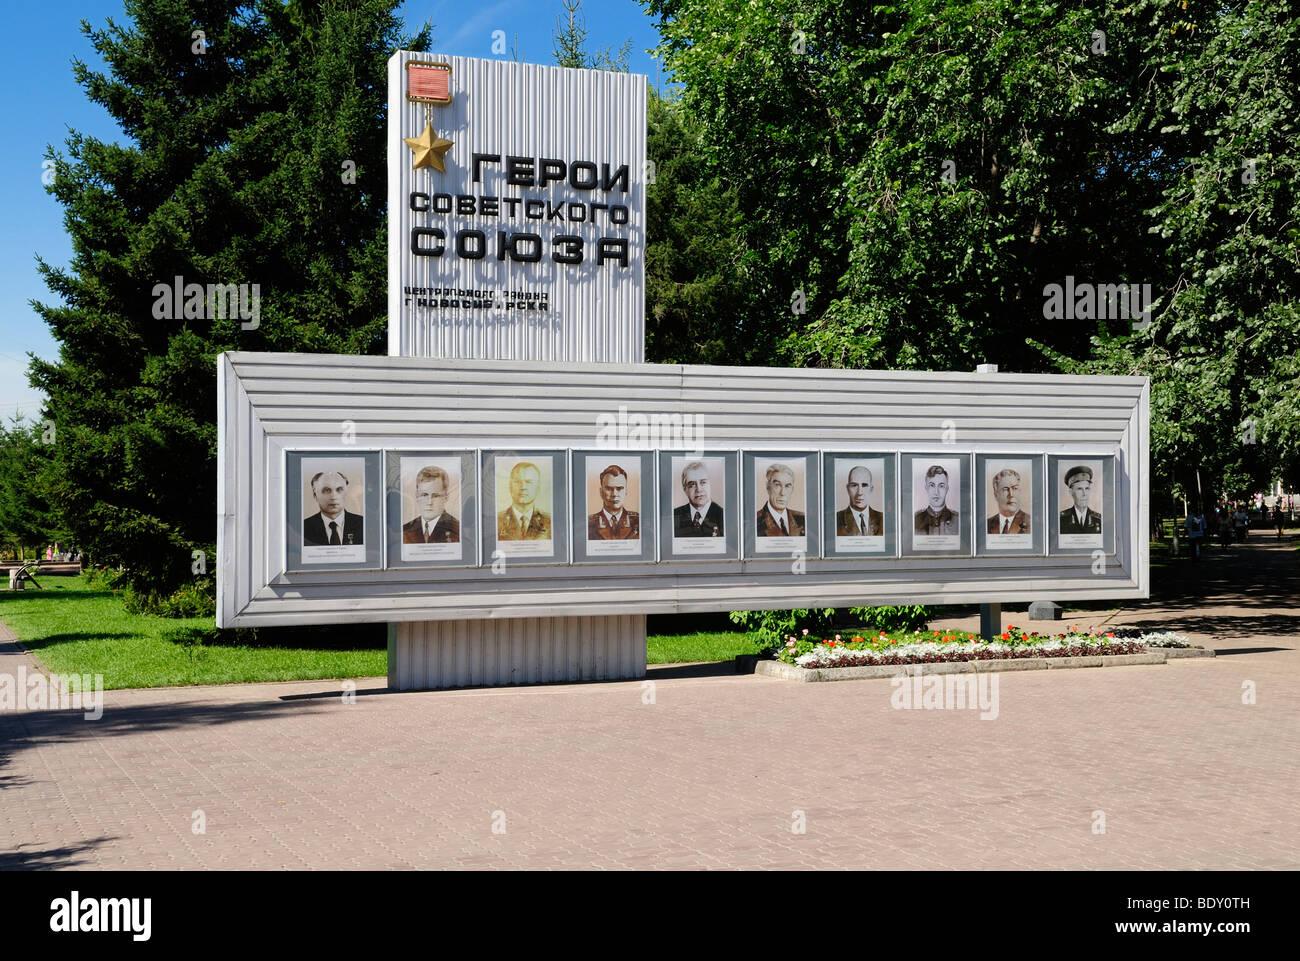 Sovjet propaganda monument, Novosibirsk, Siberia, Russia, Asia - Stock Image